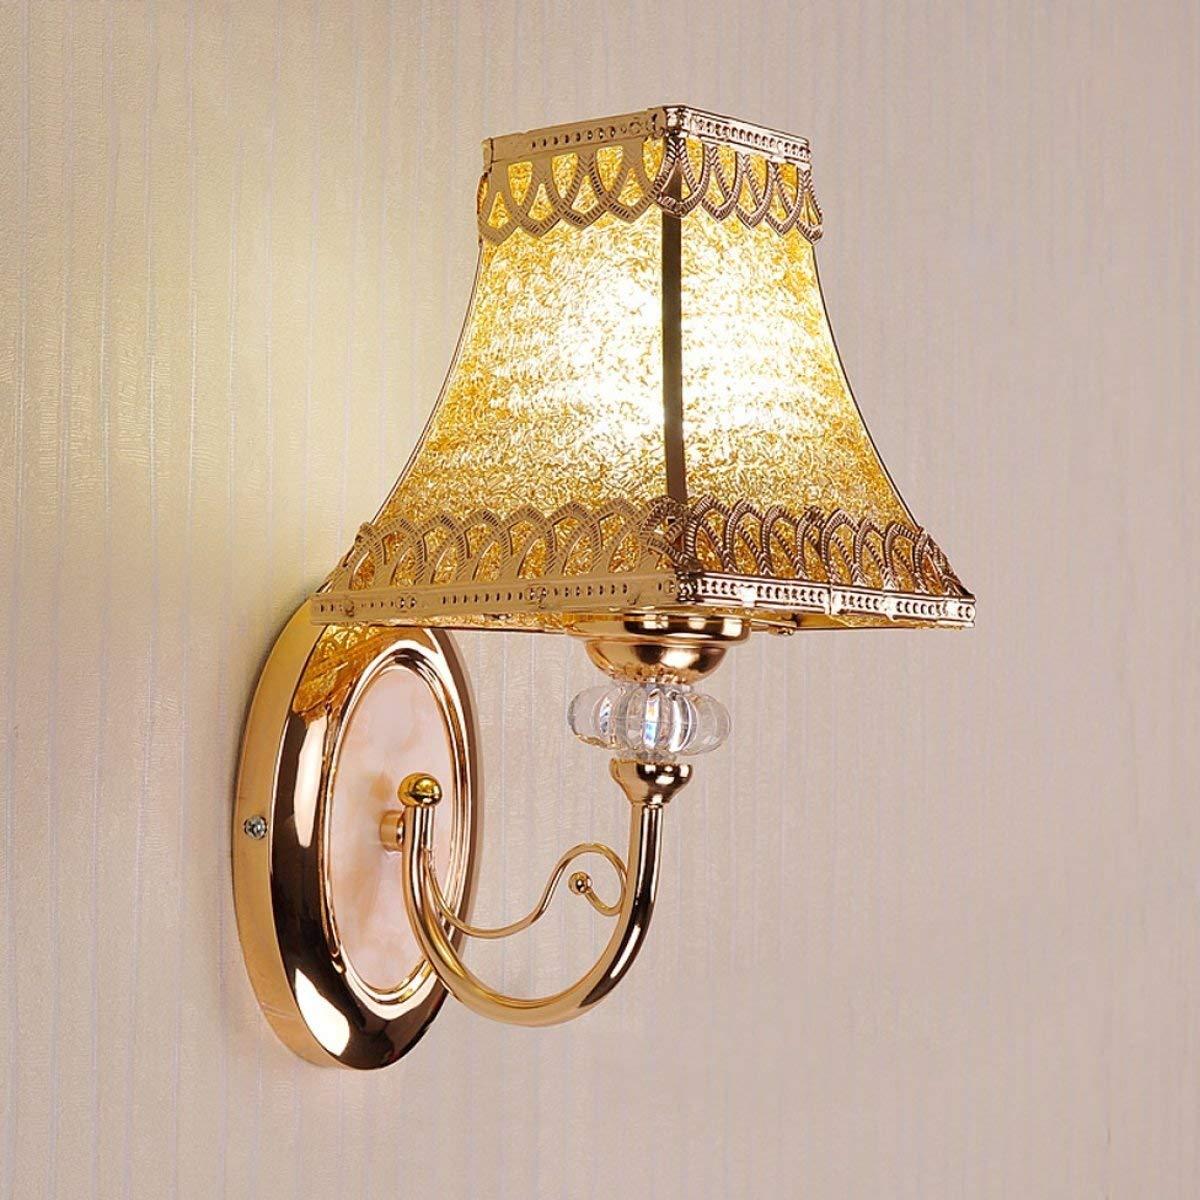 BXJ ヨーロッパの鉄の壁ランプ樹脂の壁ランプ寝室の壁ランプベッドサイドの壁ランプE27光源 B07R9MHC7Y